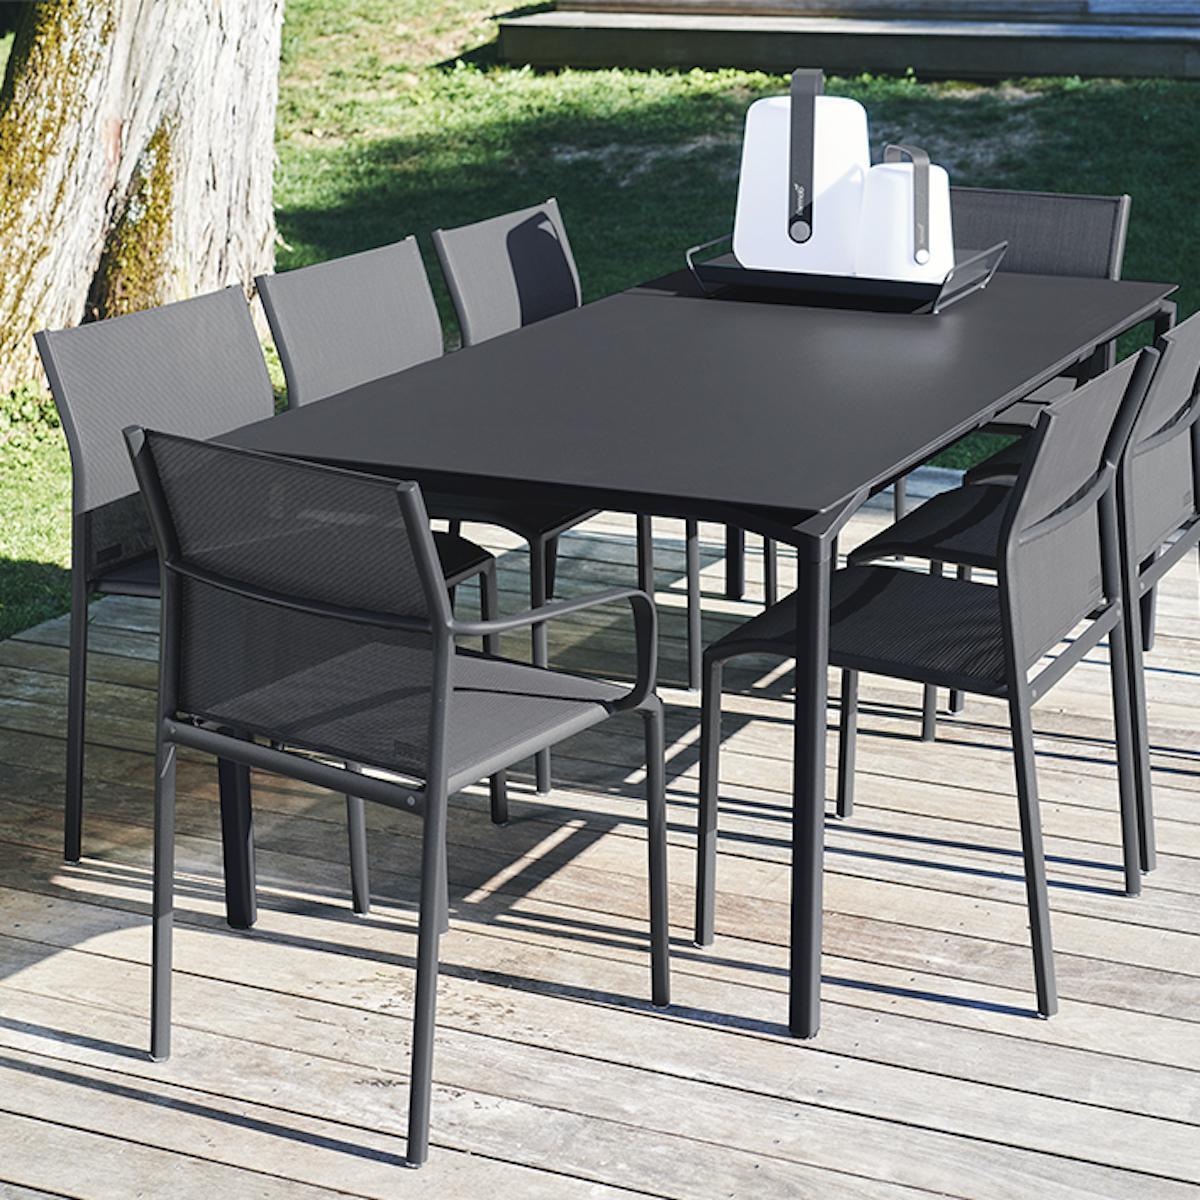 Table 95x195cm CALVI Fermob gris métal